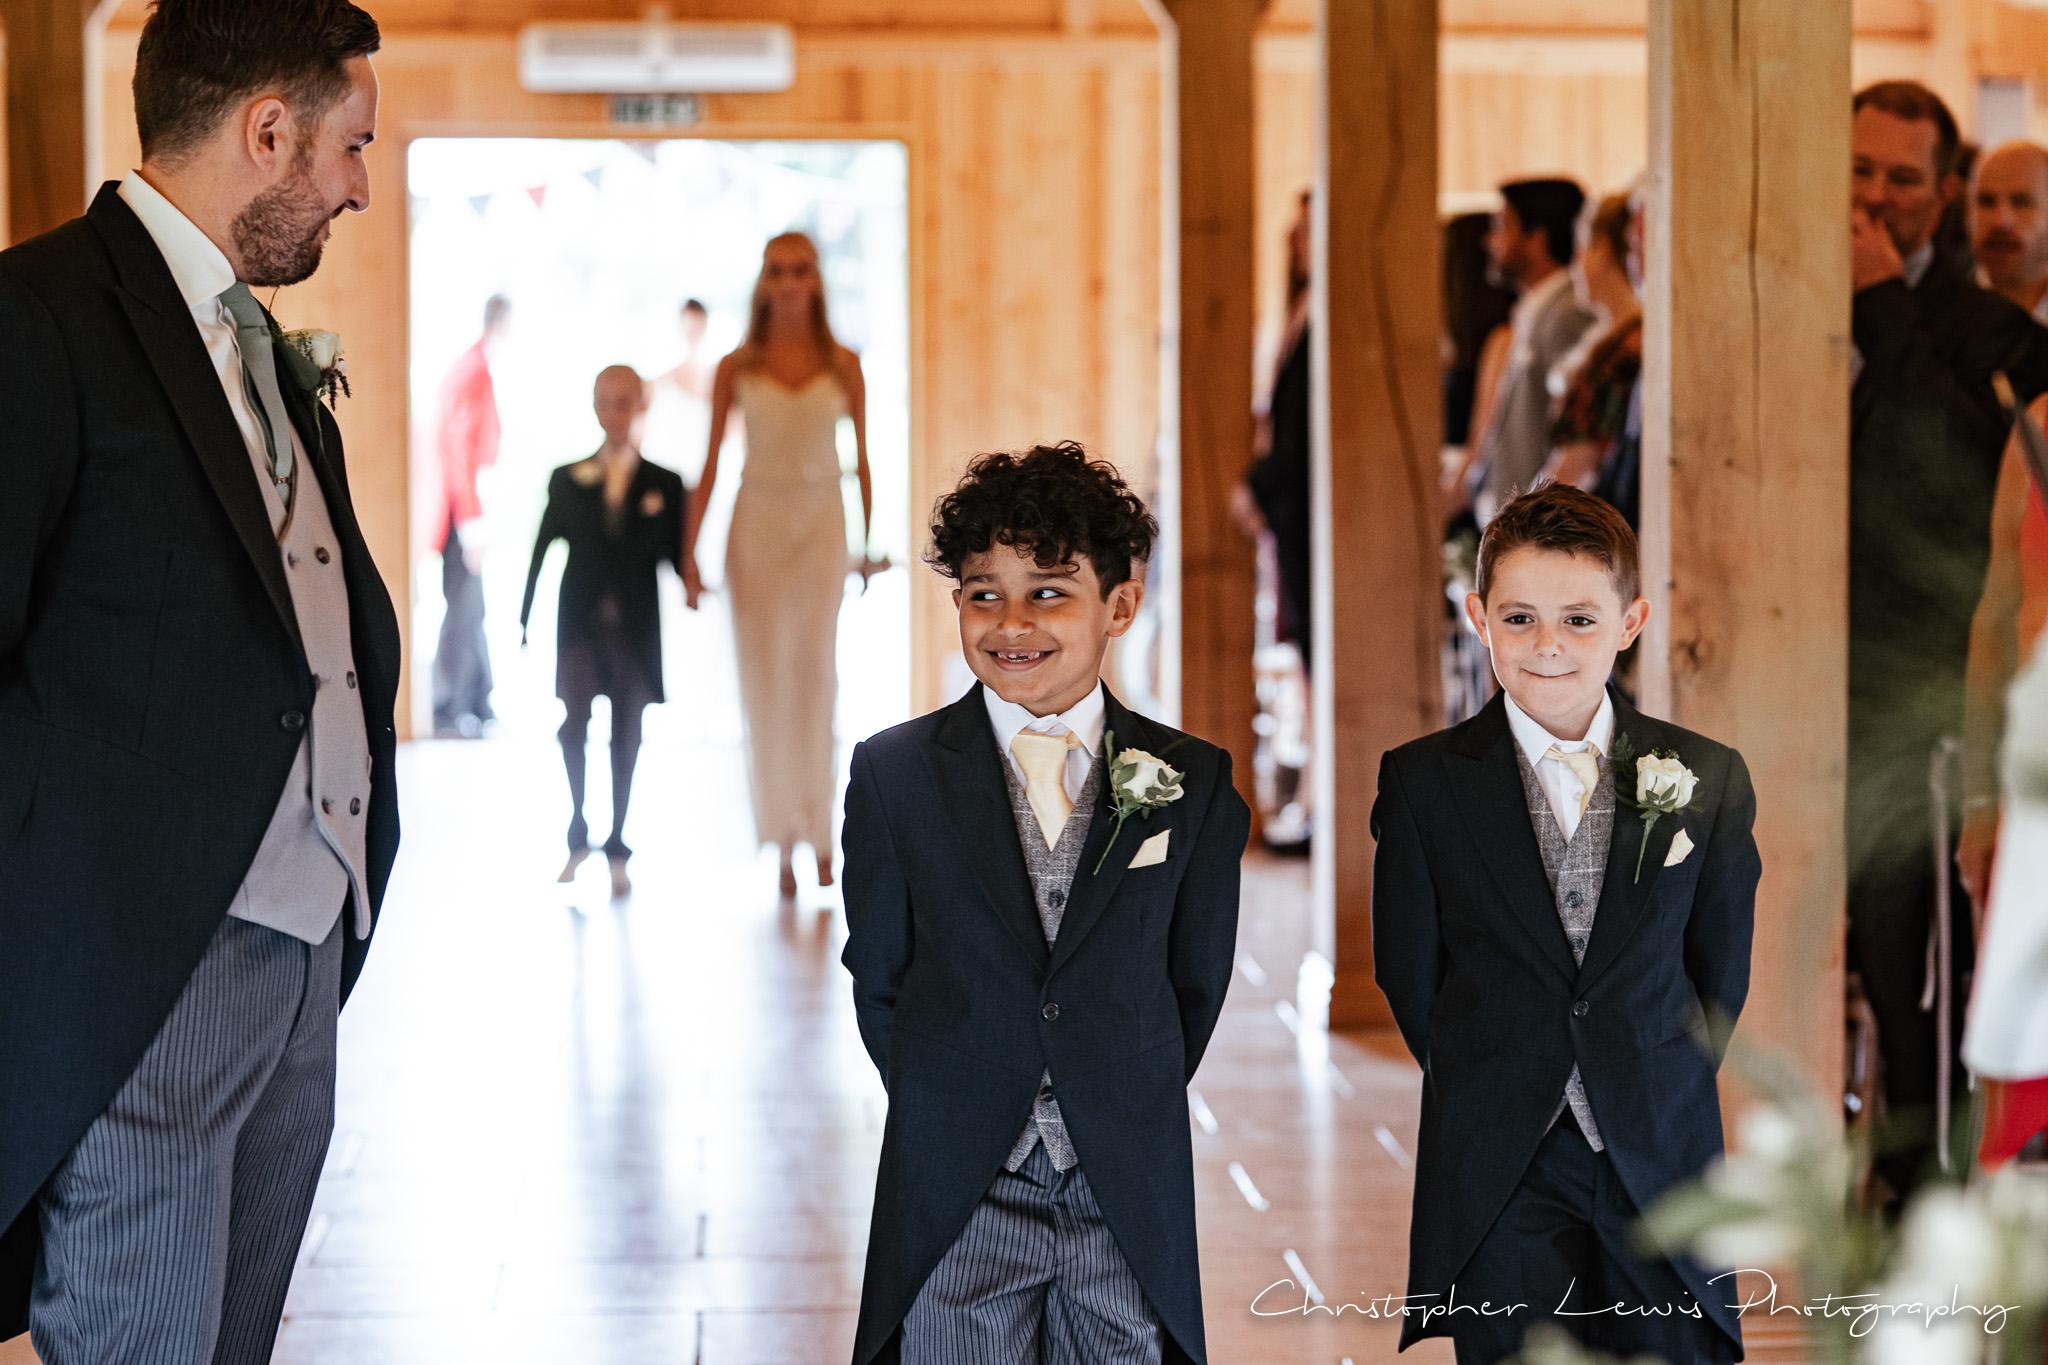 Colshaw Hall Wedding